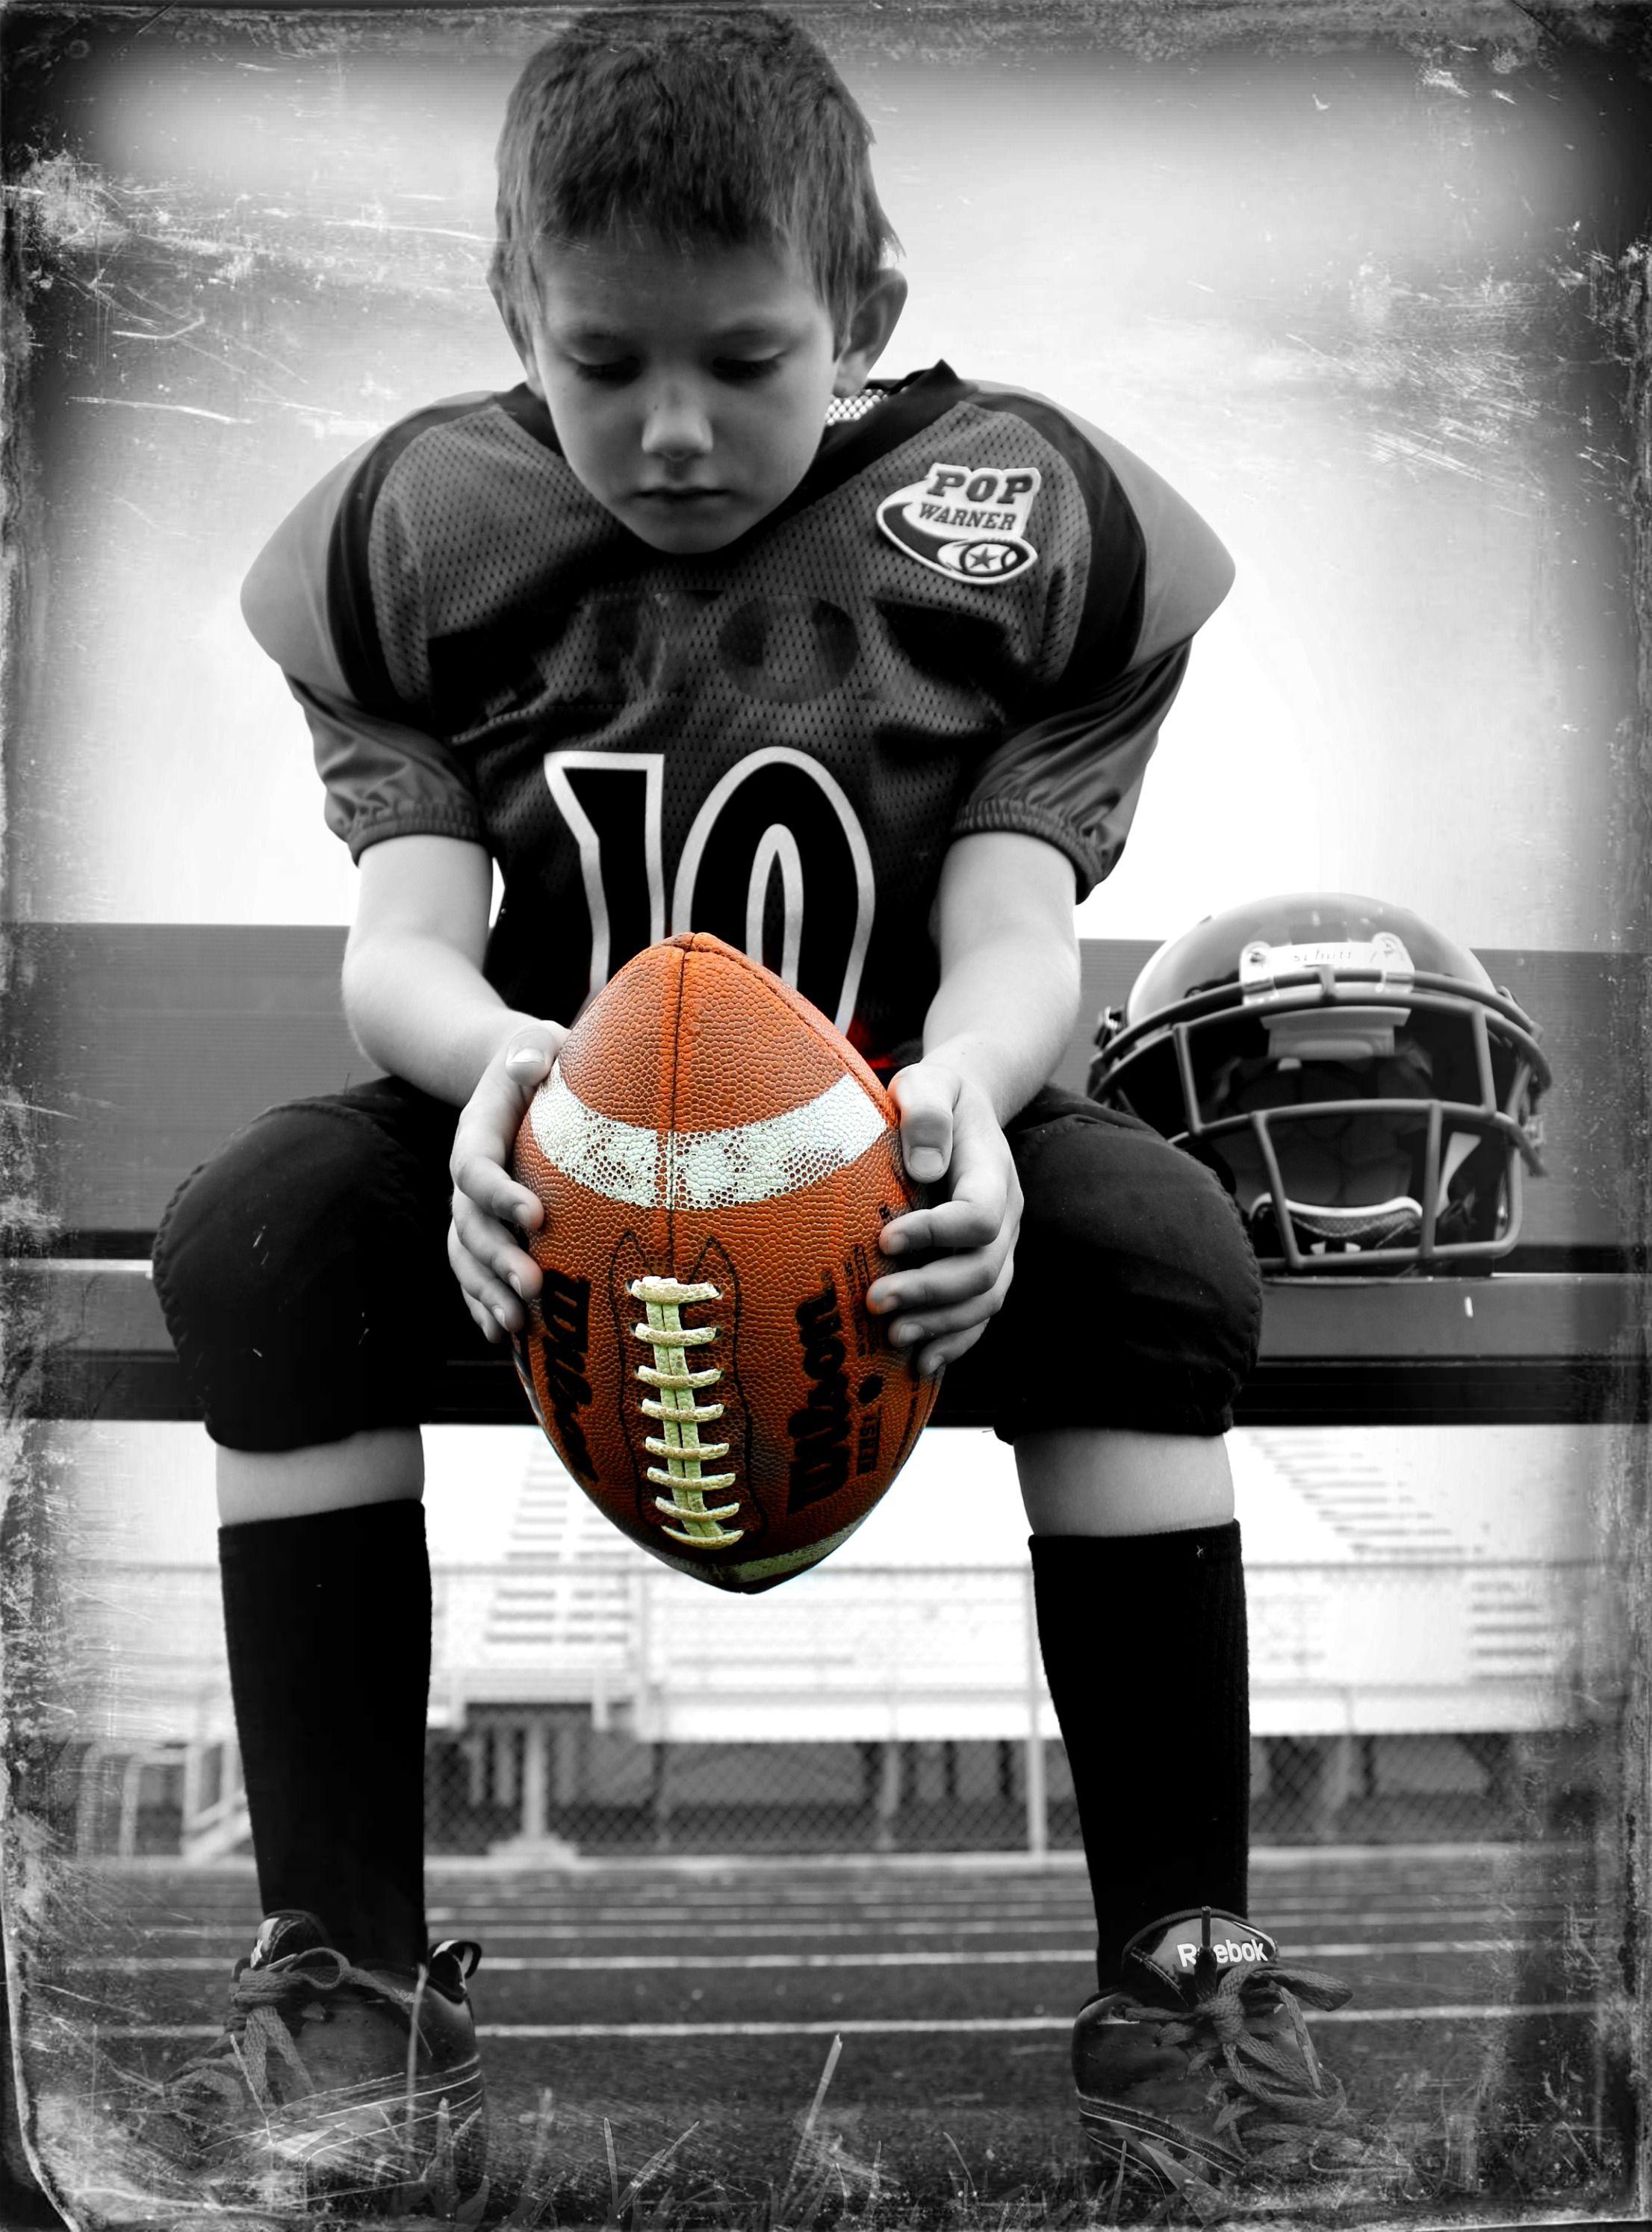 Pin by Cathy Short on FOOTBALL | Football poses, Football ...